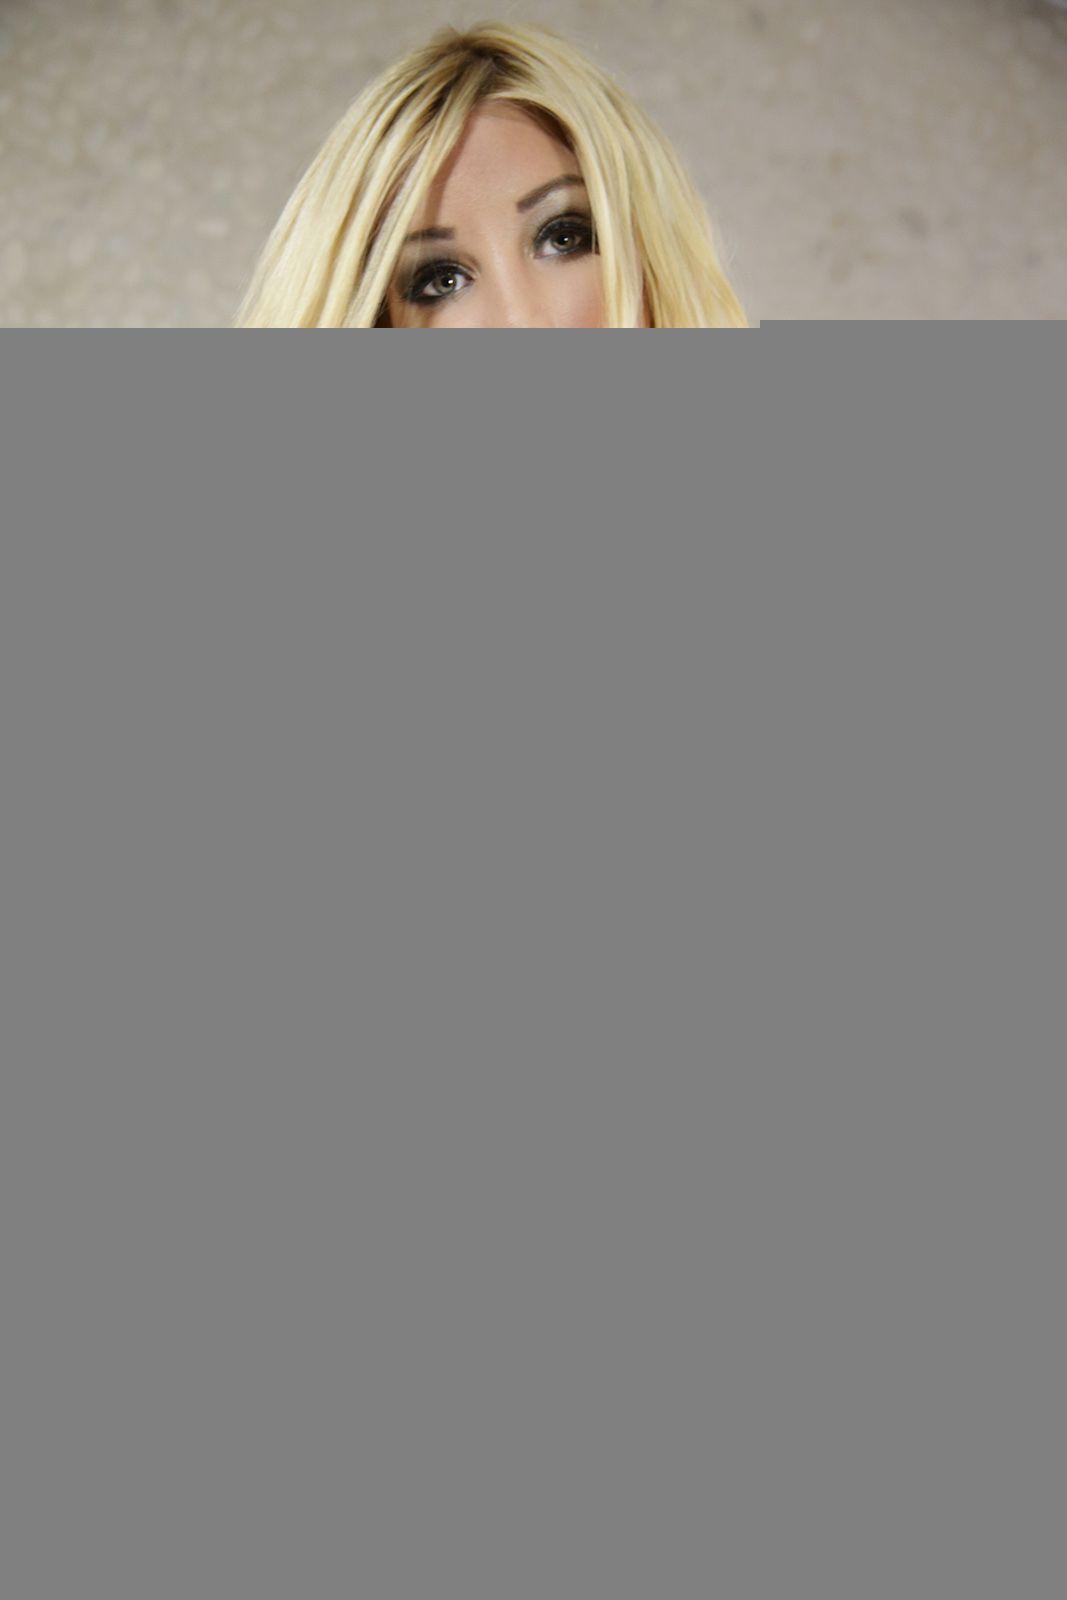 Amy Acker Nackt kimber james tranny porn - top porn images. comments: 3